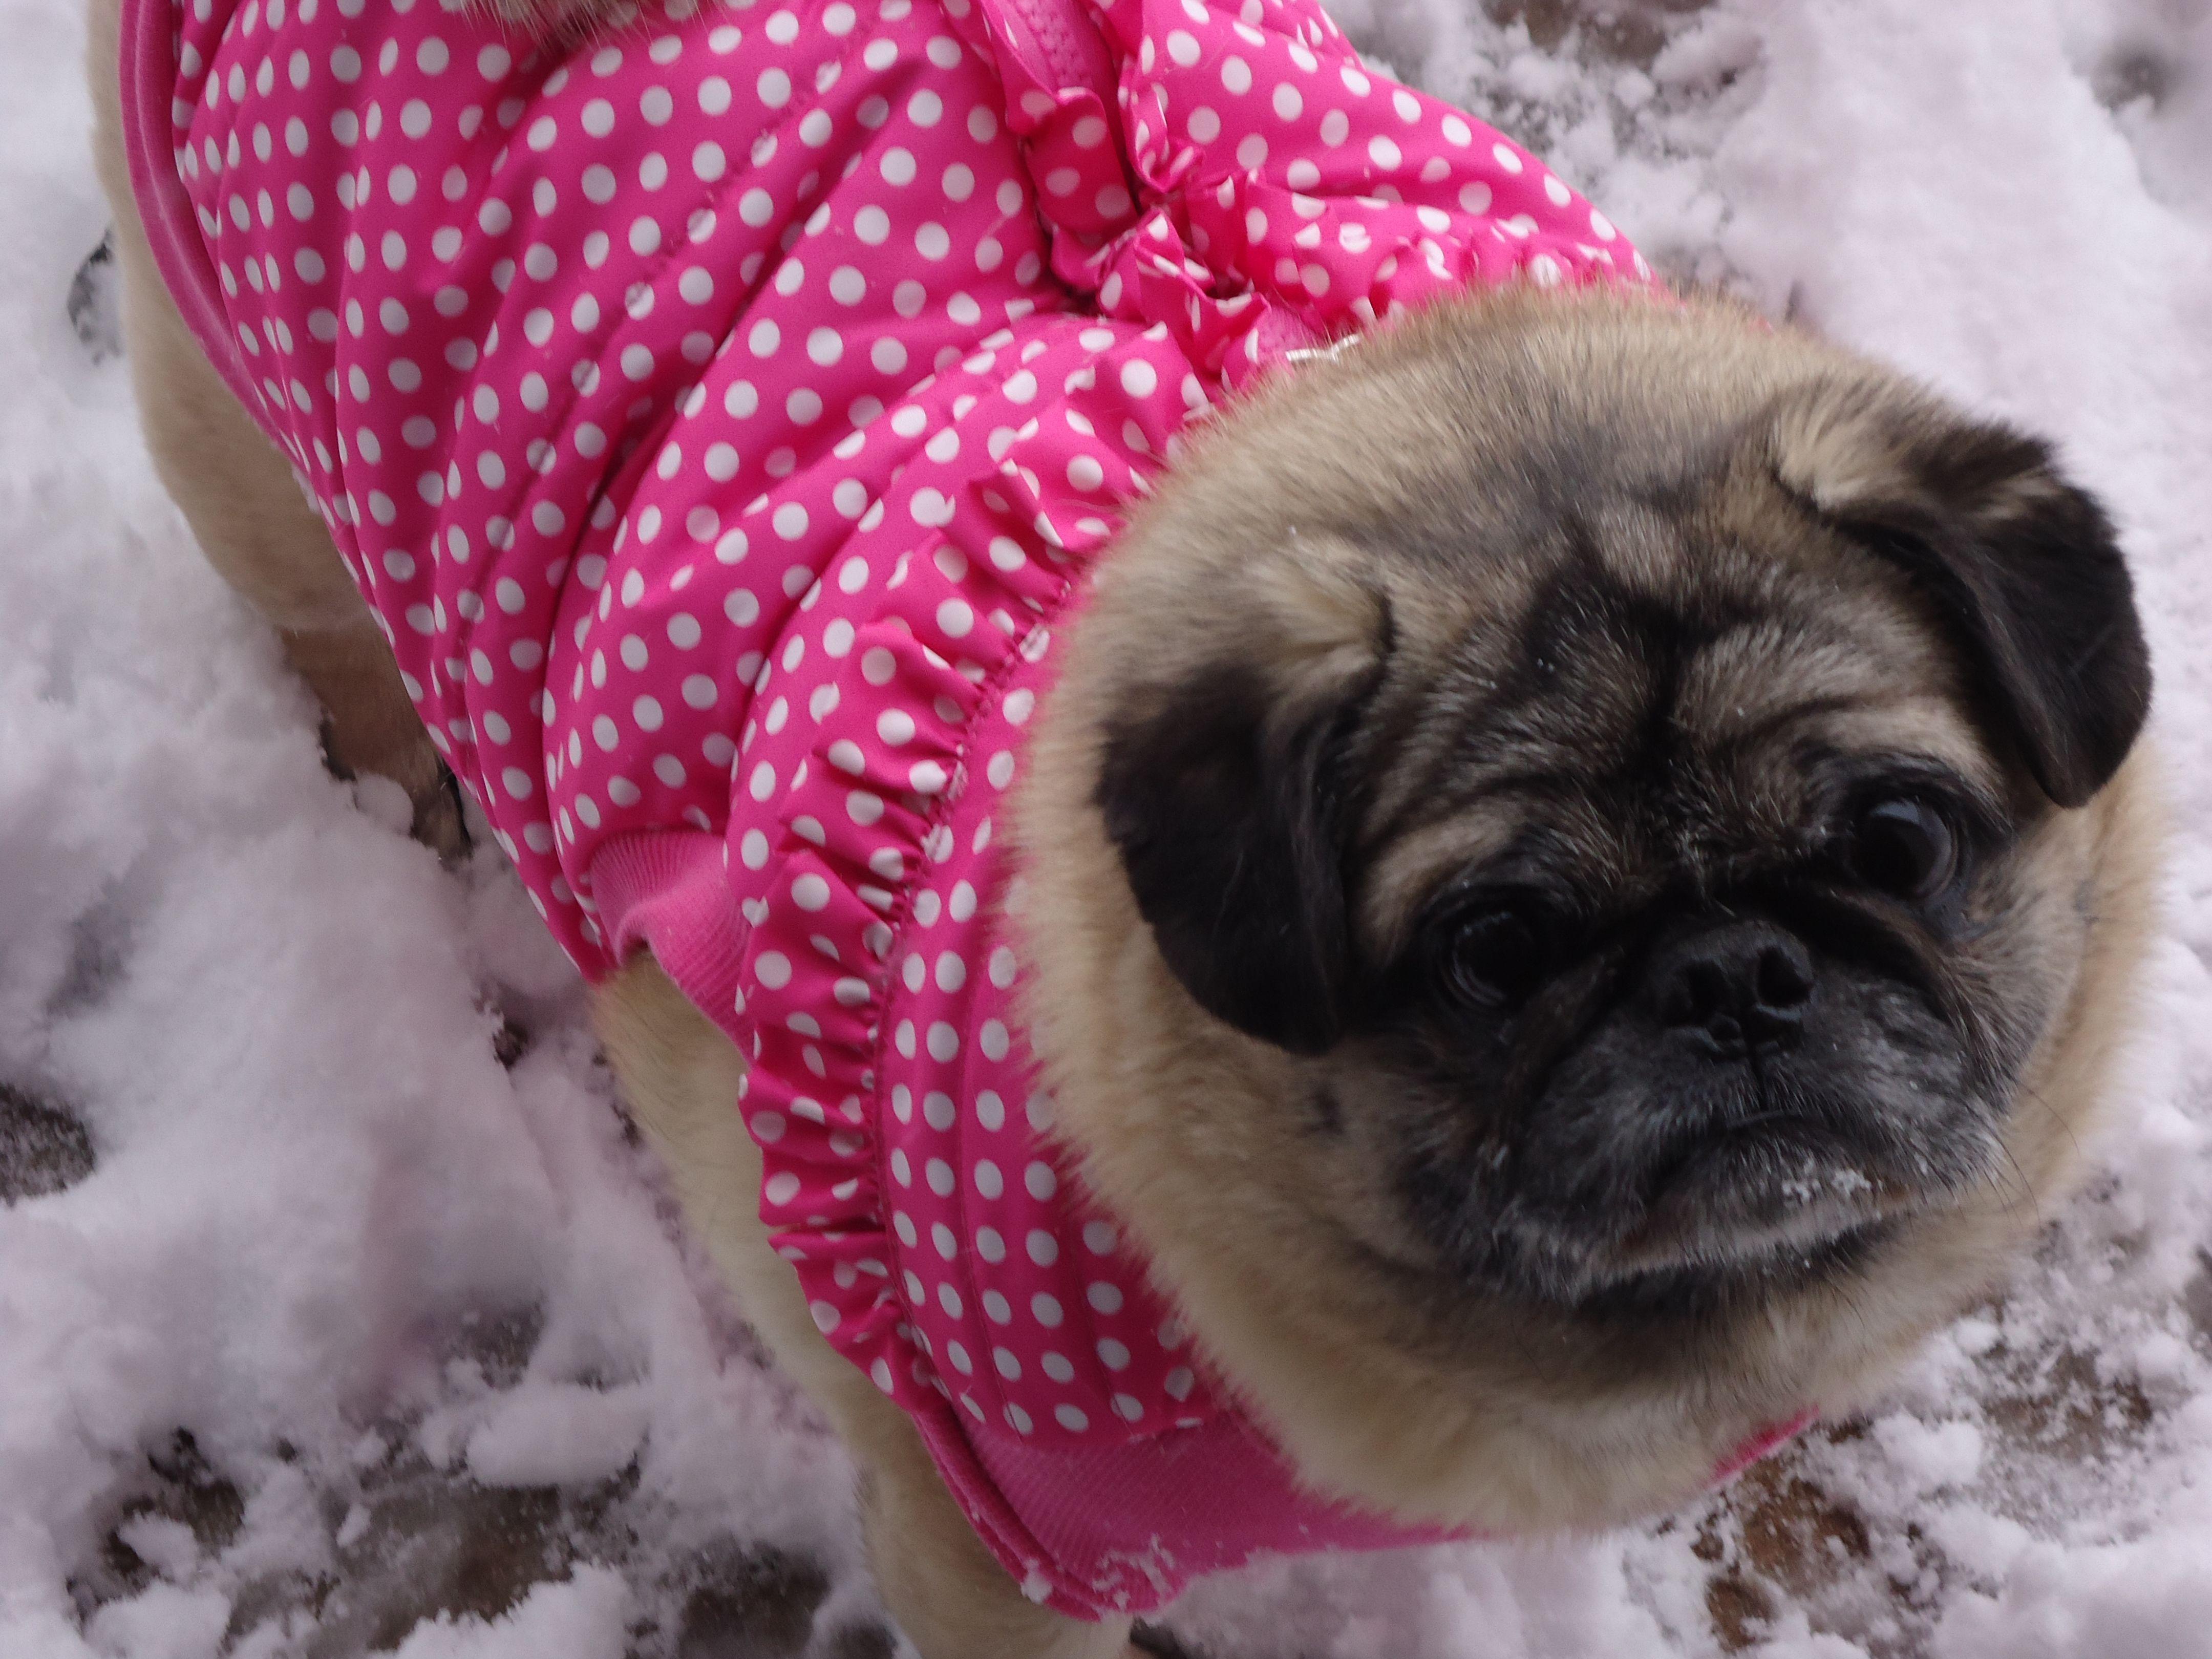 Lola My Beautiful Pekepug 3 Small Dogs Animals Pugs